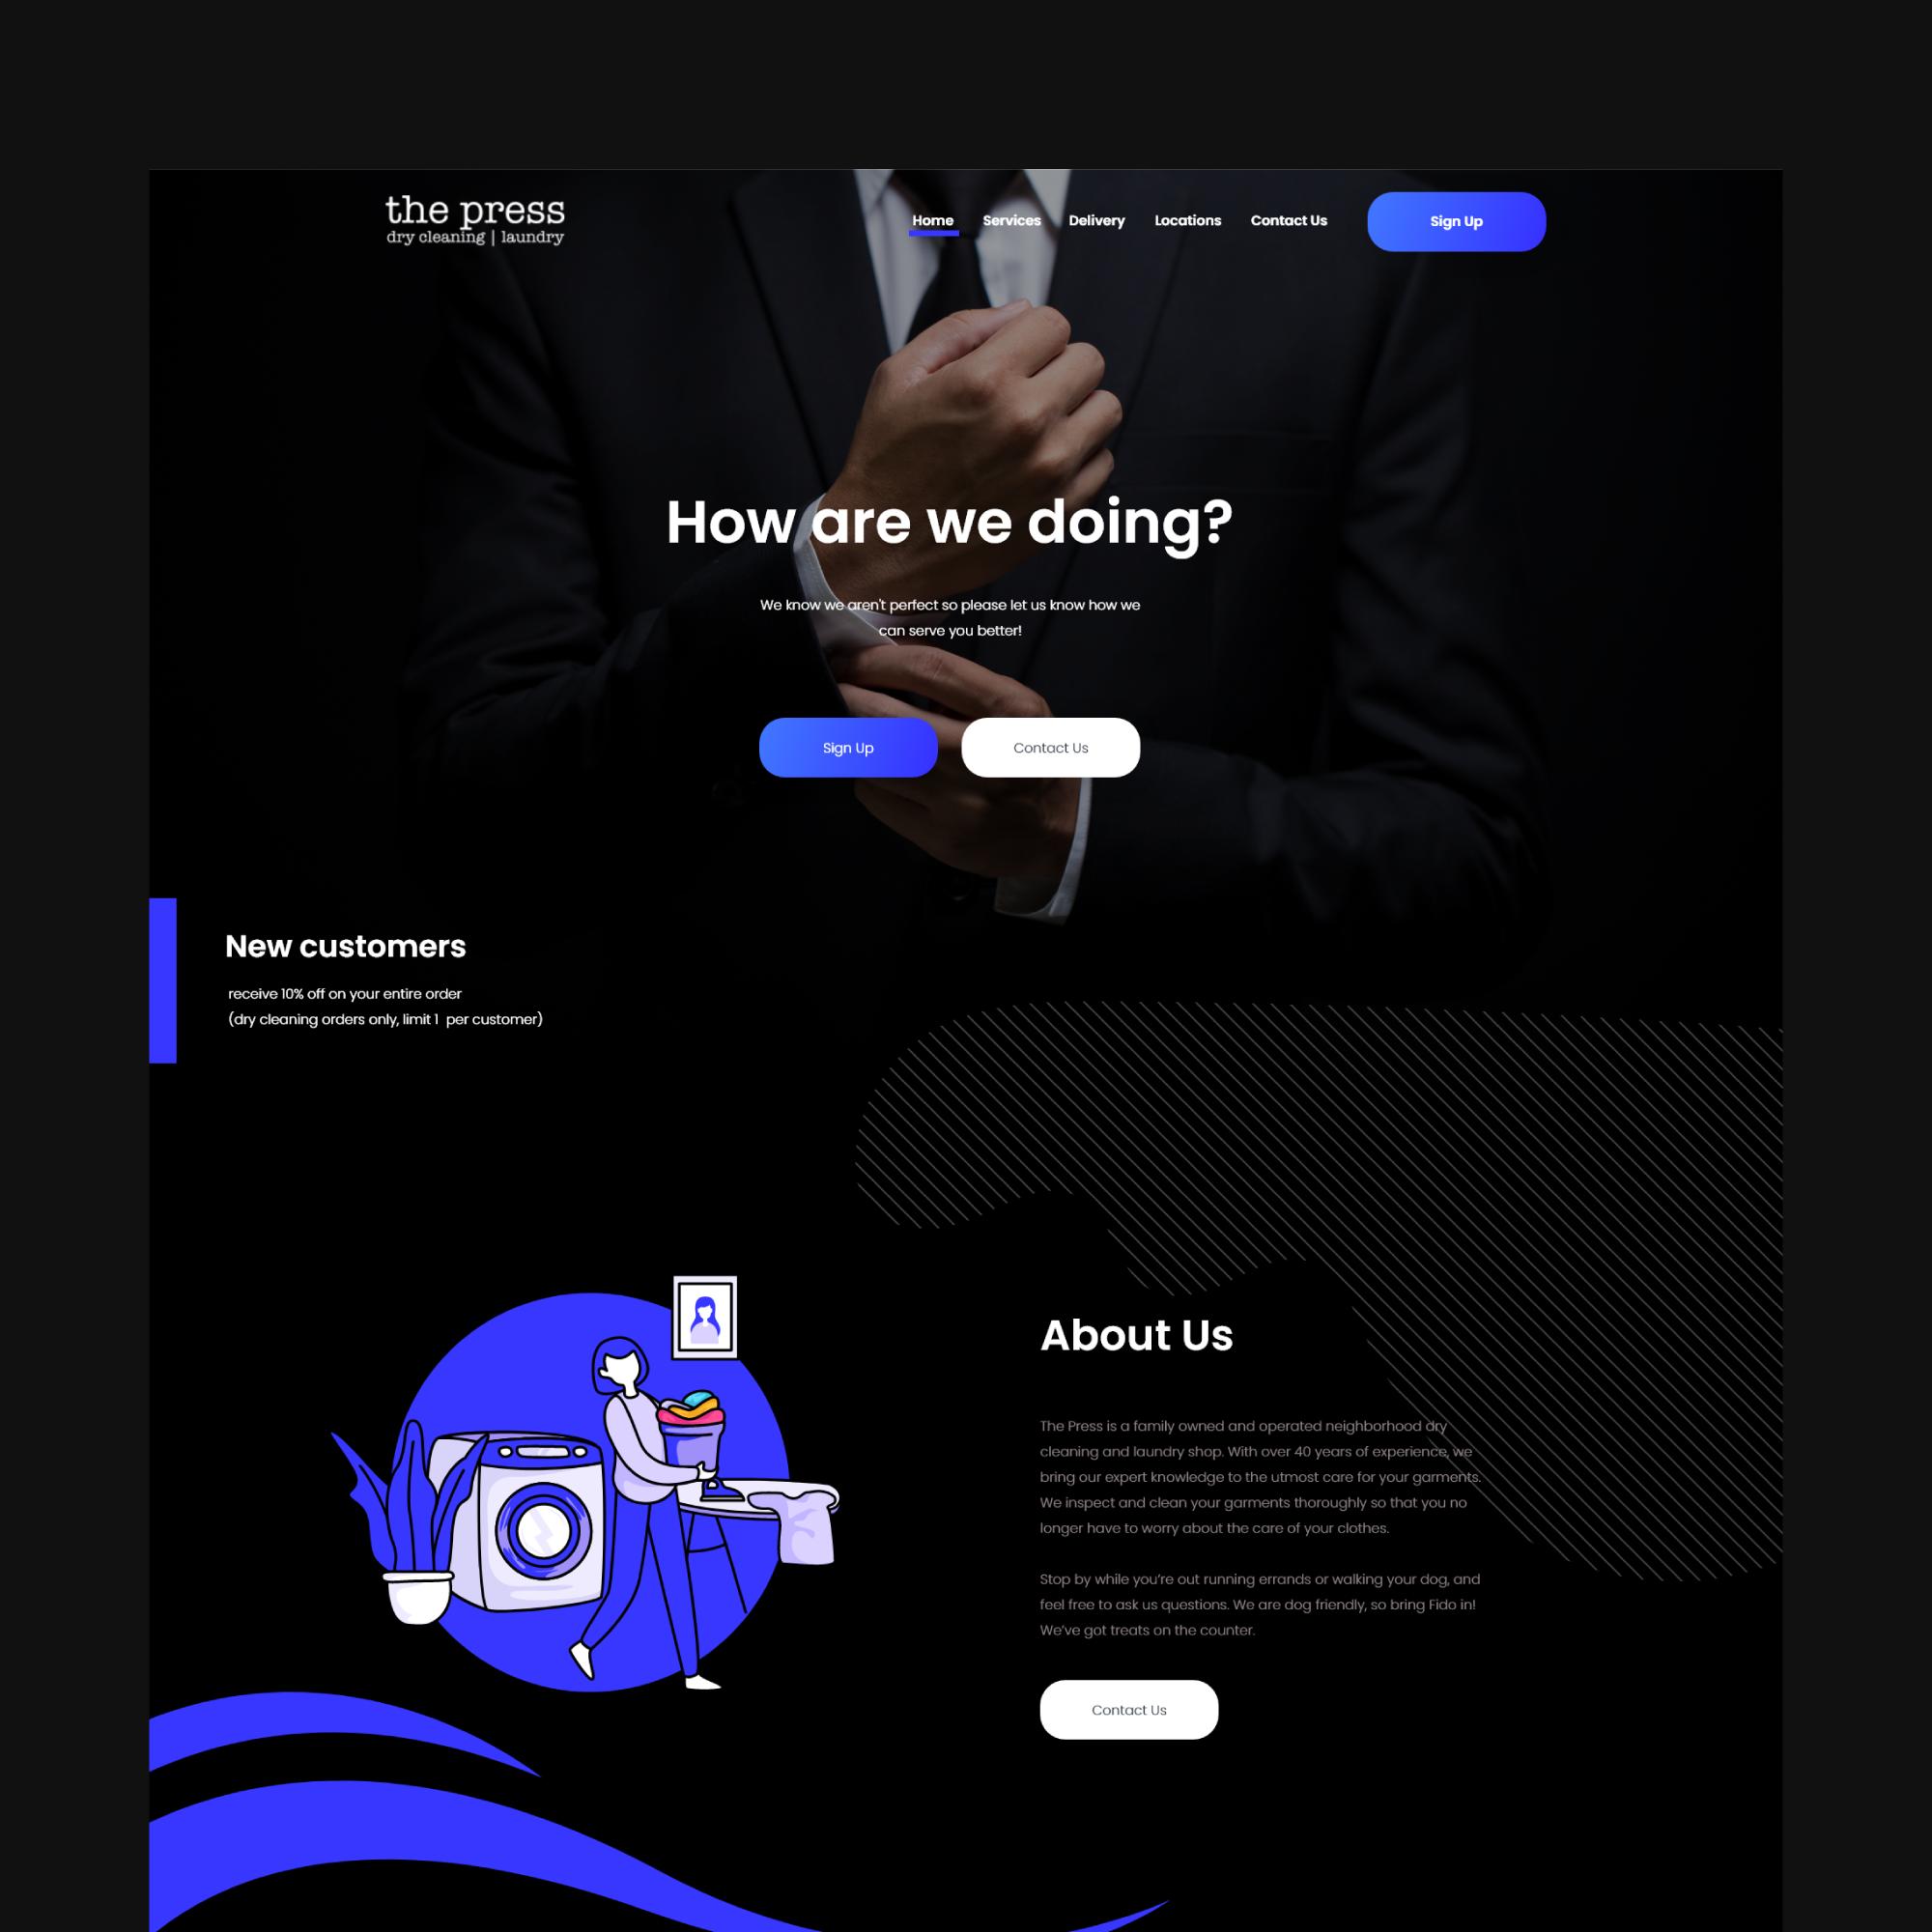 The Press Website Design In 2020 Website Design Creative Web Design Web Design